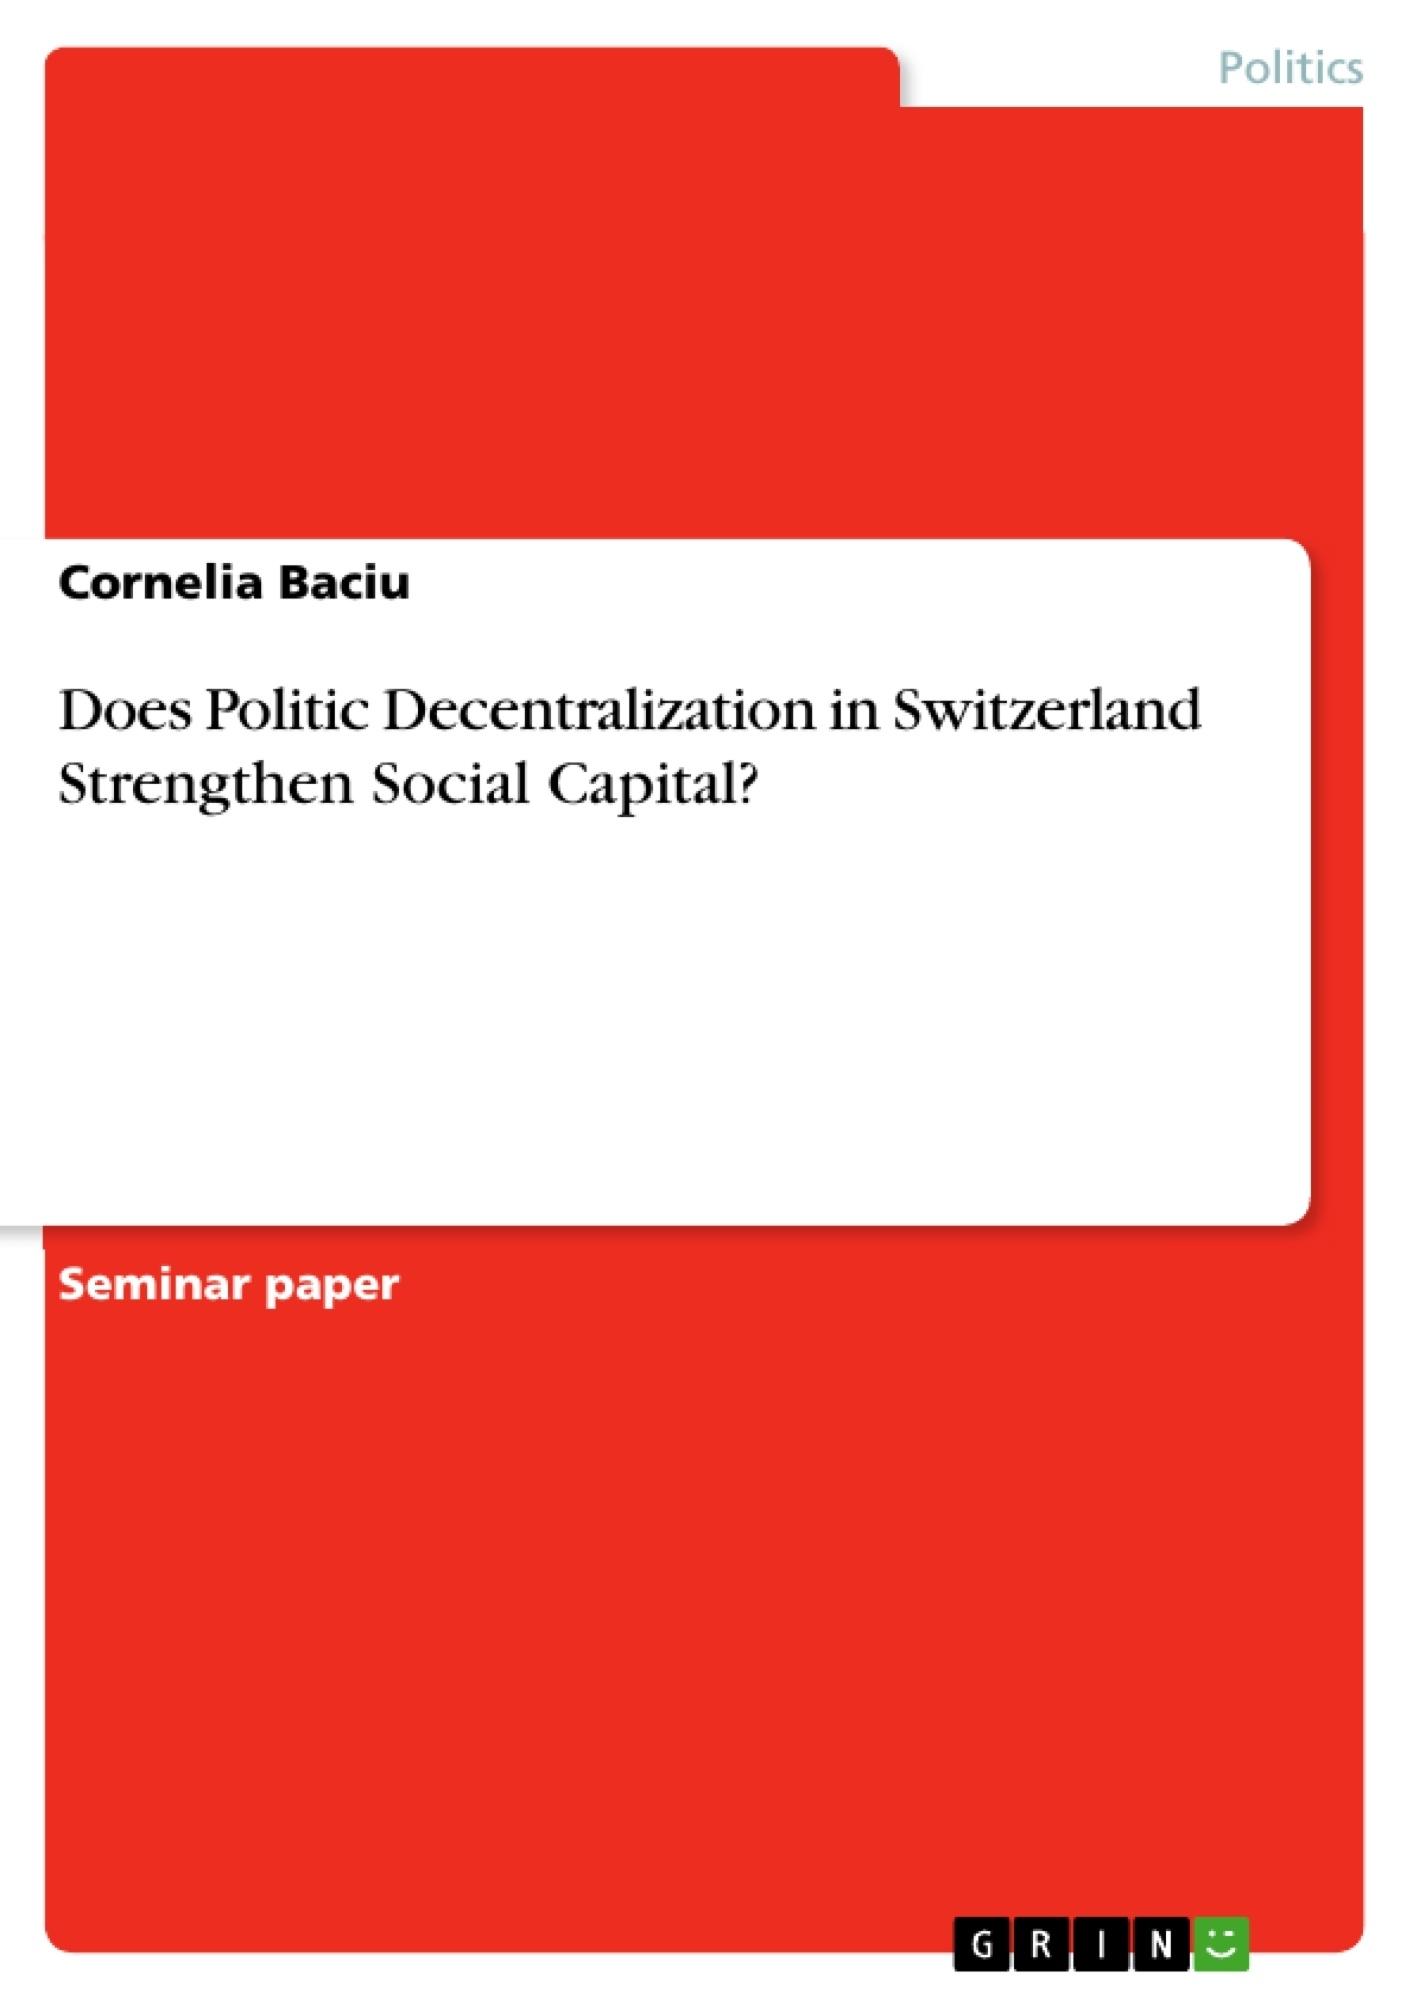 Title: Does Politic Decentralization in Switzerland Strengthen Social Capital?